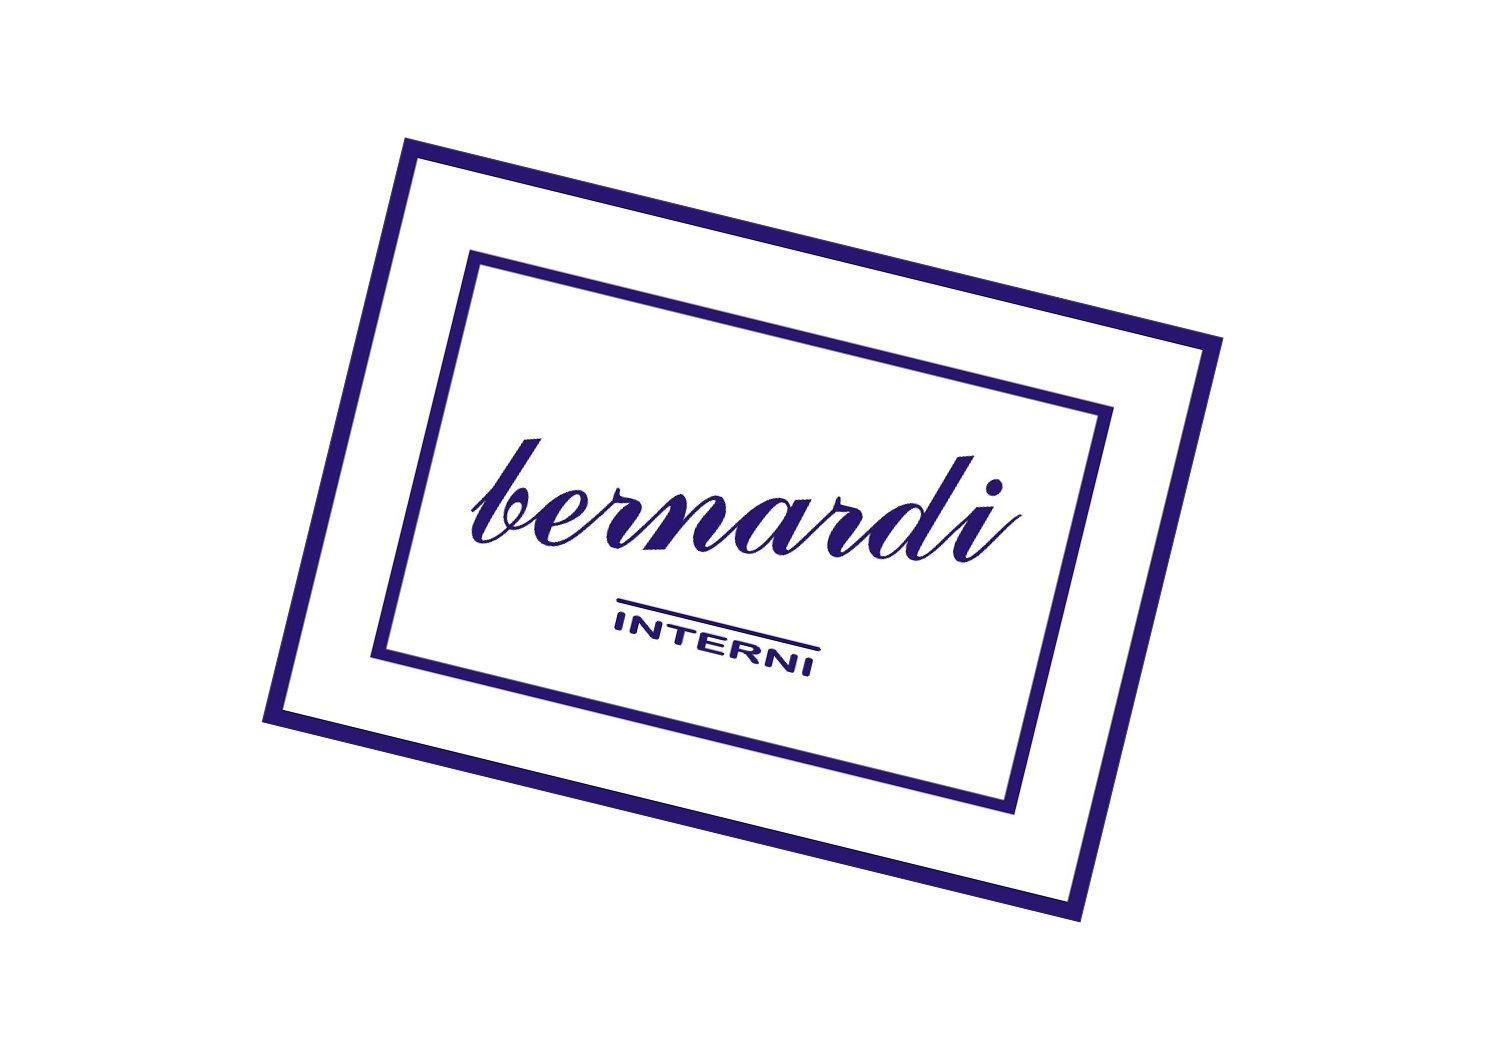 Bernardi Interni